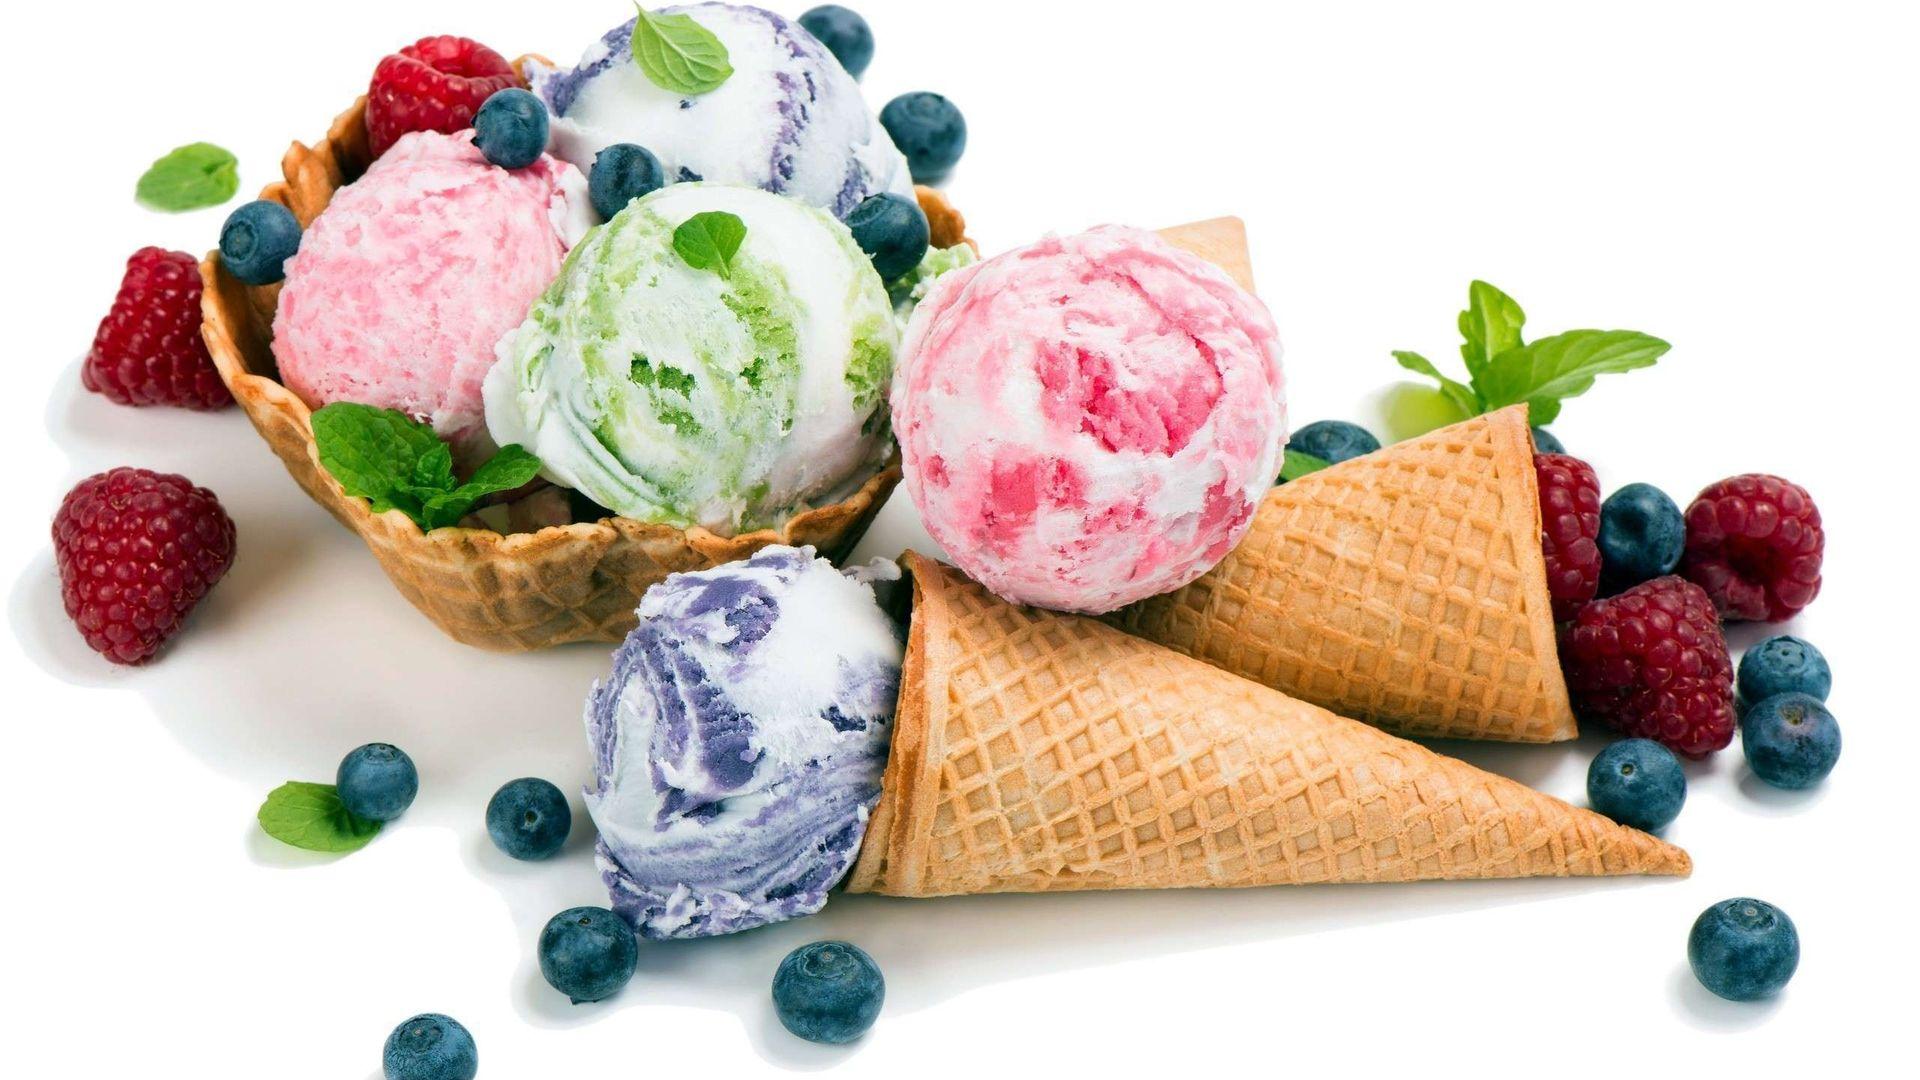 Ice Cream And Berries With White Background - Ice Cream ...